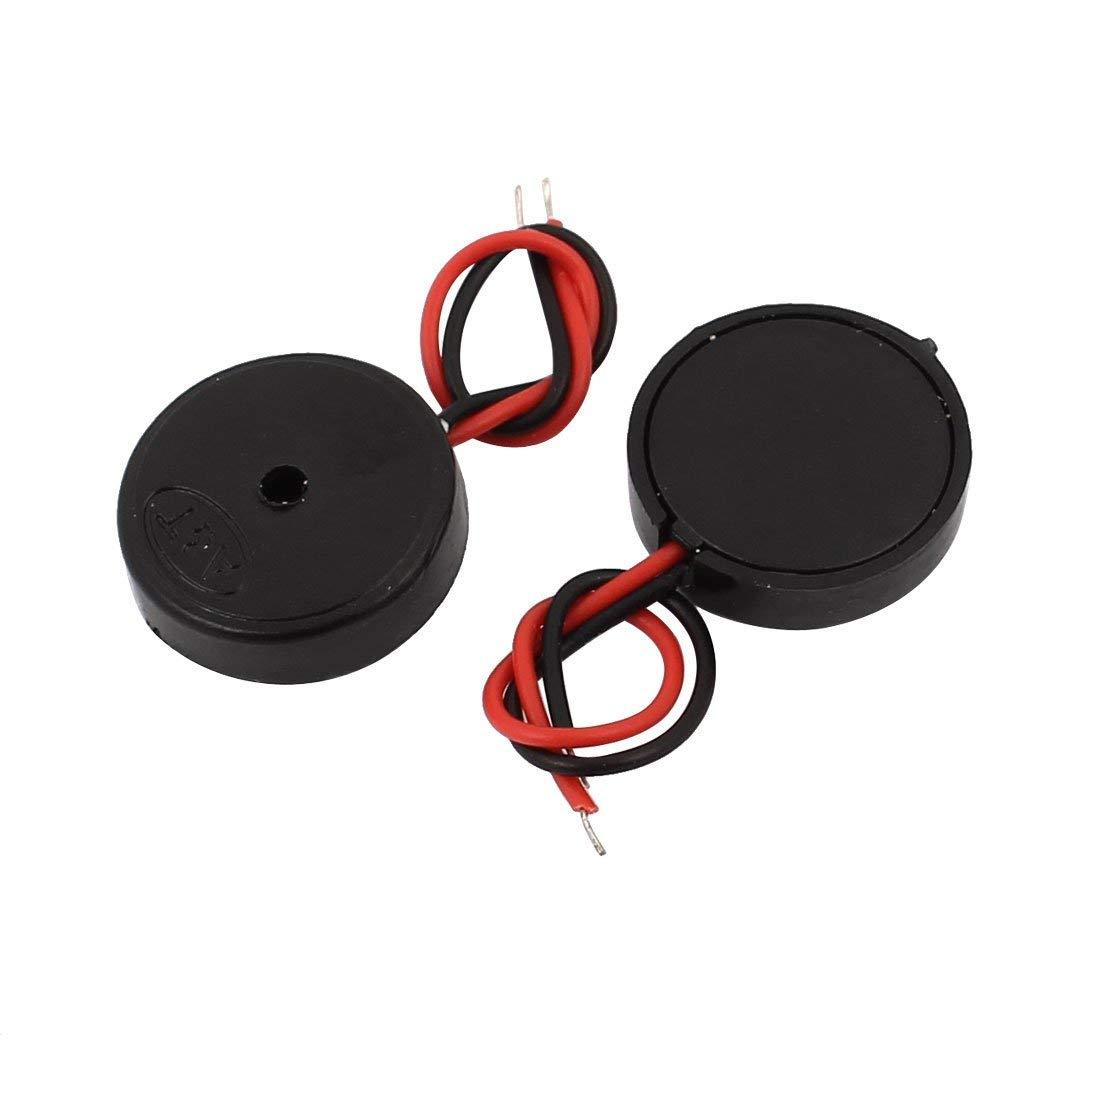 Aexit 2Pcs DC 30V 80dB Sound Passive Electronic Buzzer Alarm 14mm x 4mm Black